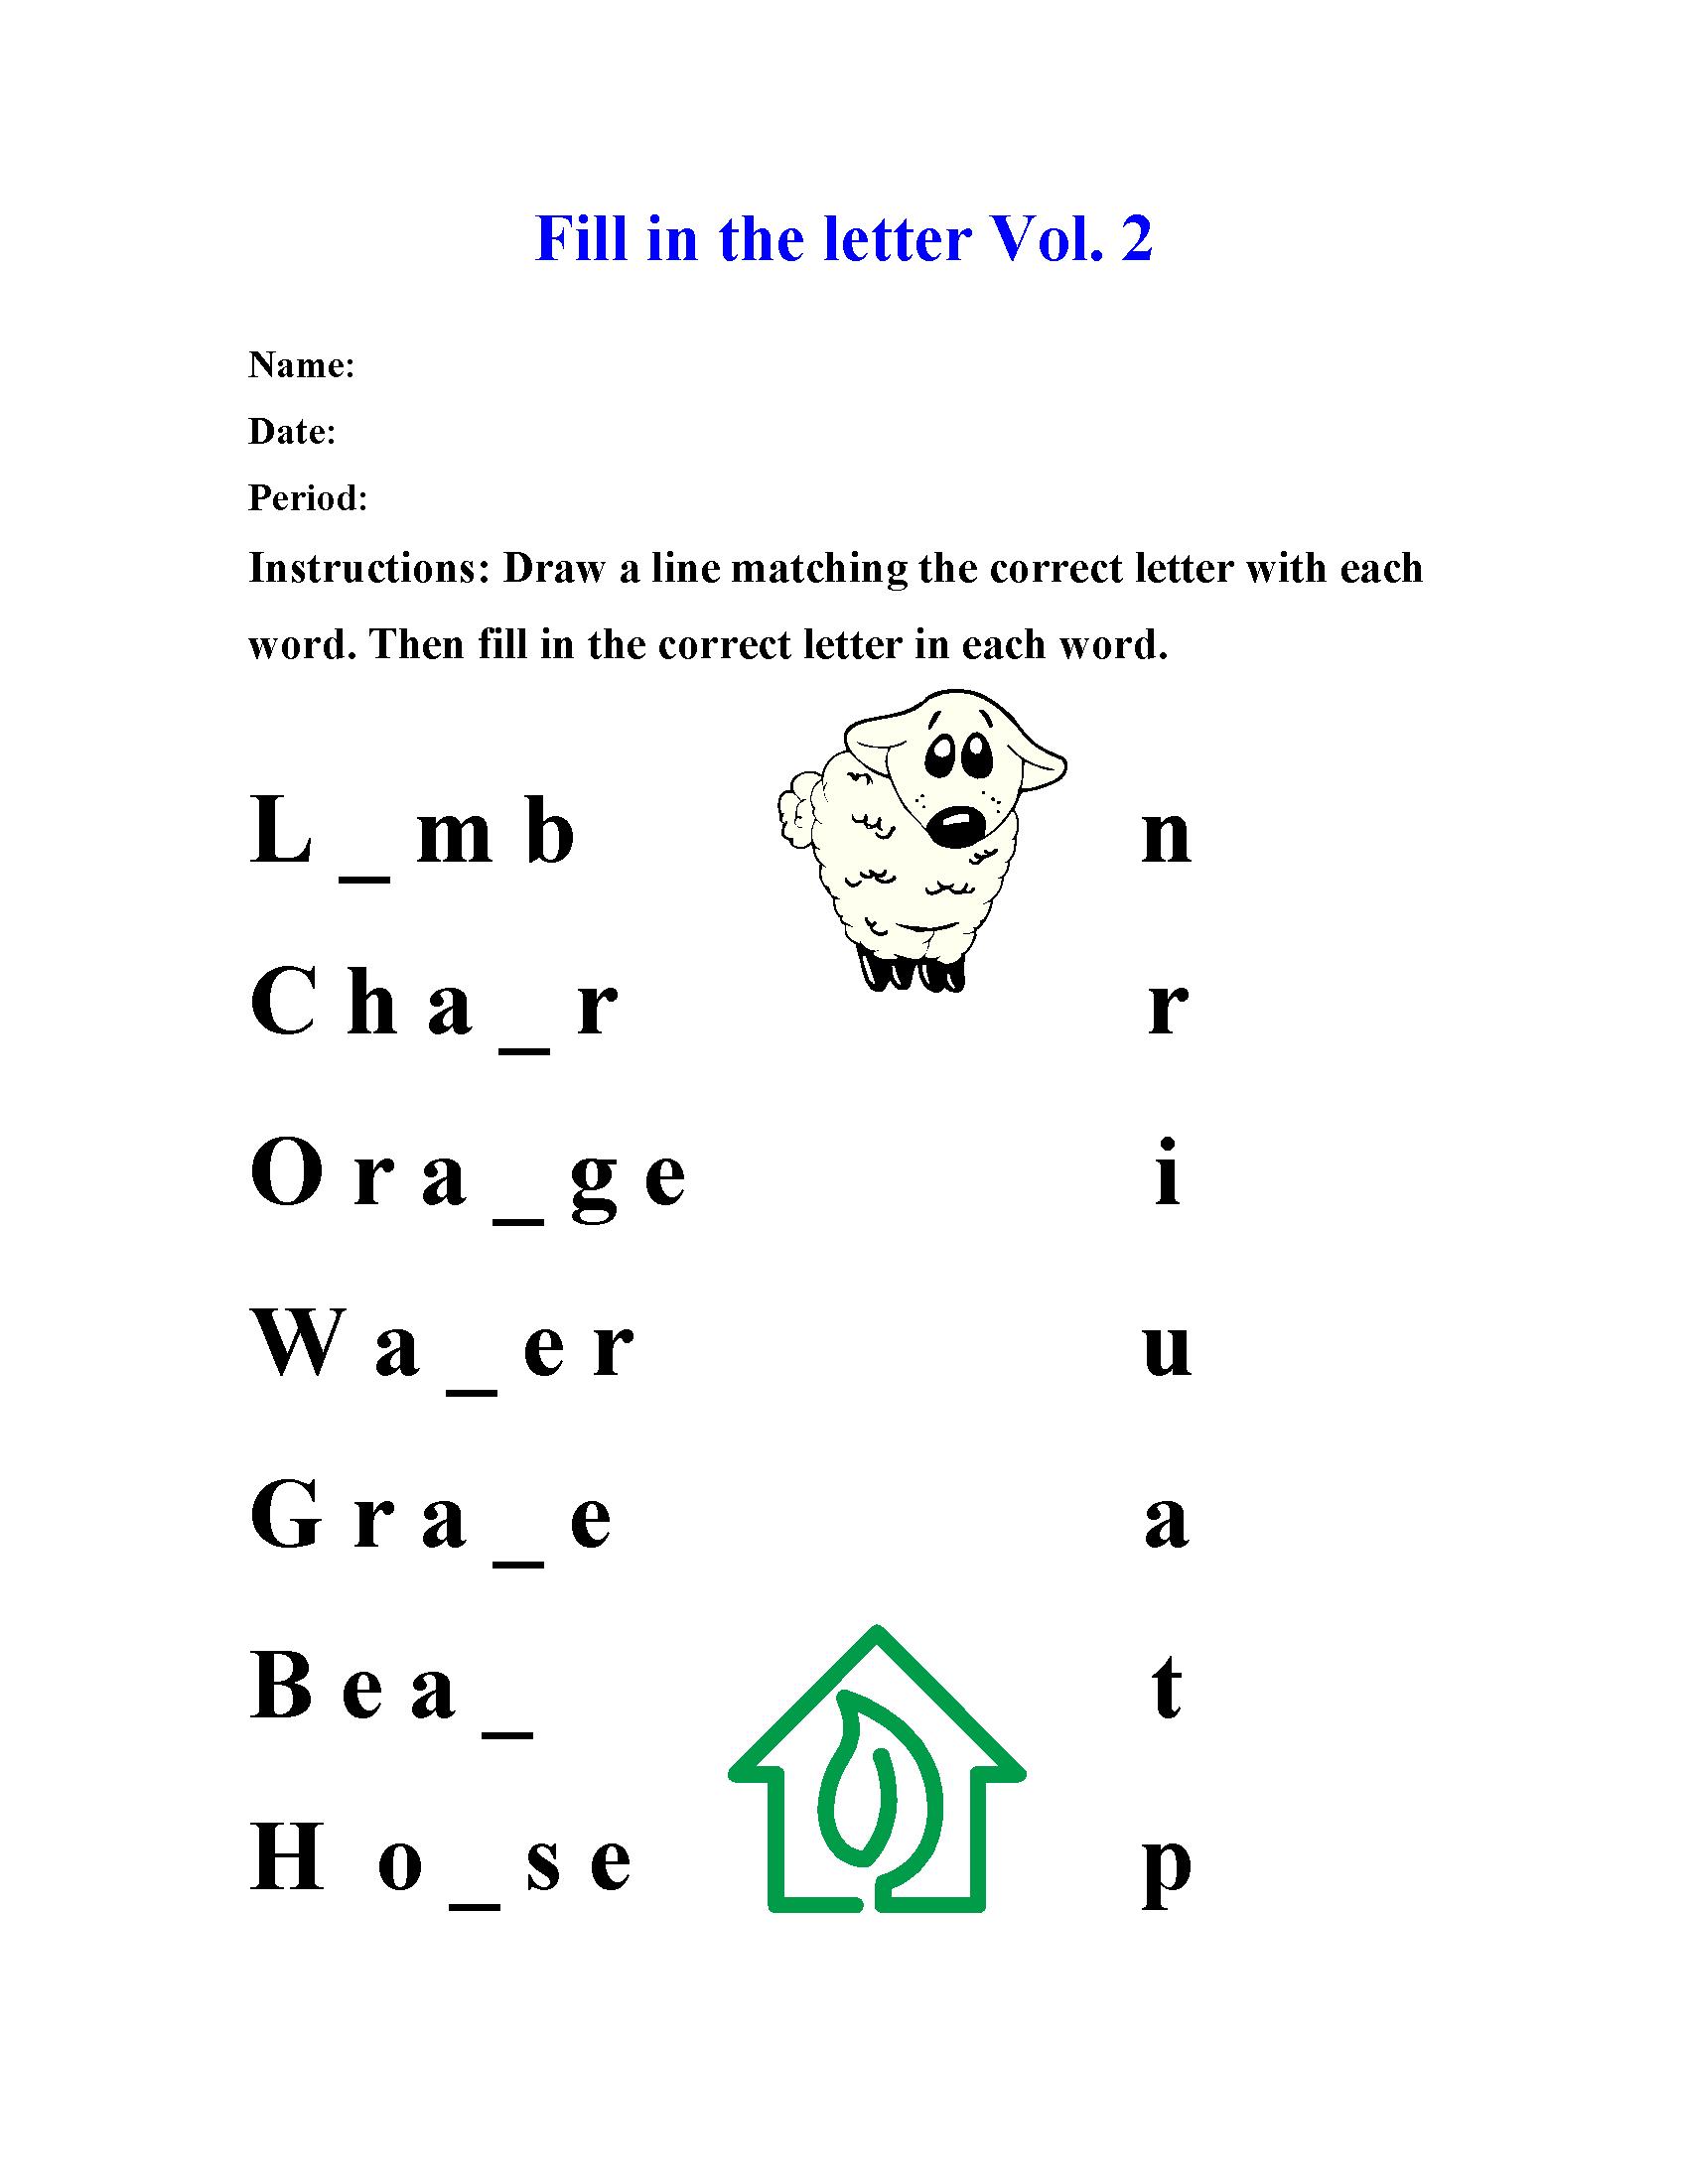 Spelling Worksheets | Fill-In The Letter Spelling Worksheets inside Alphabet Spelling Worksheets